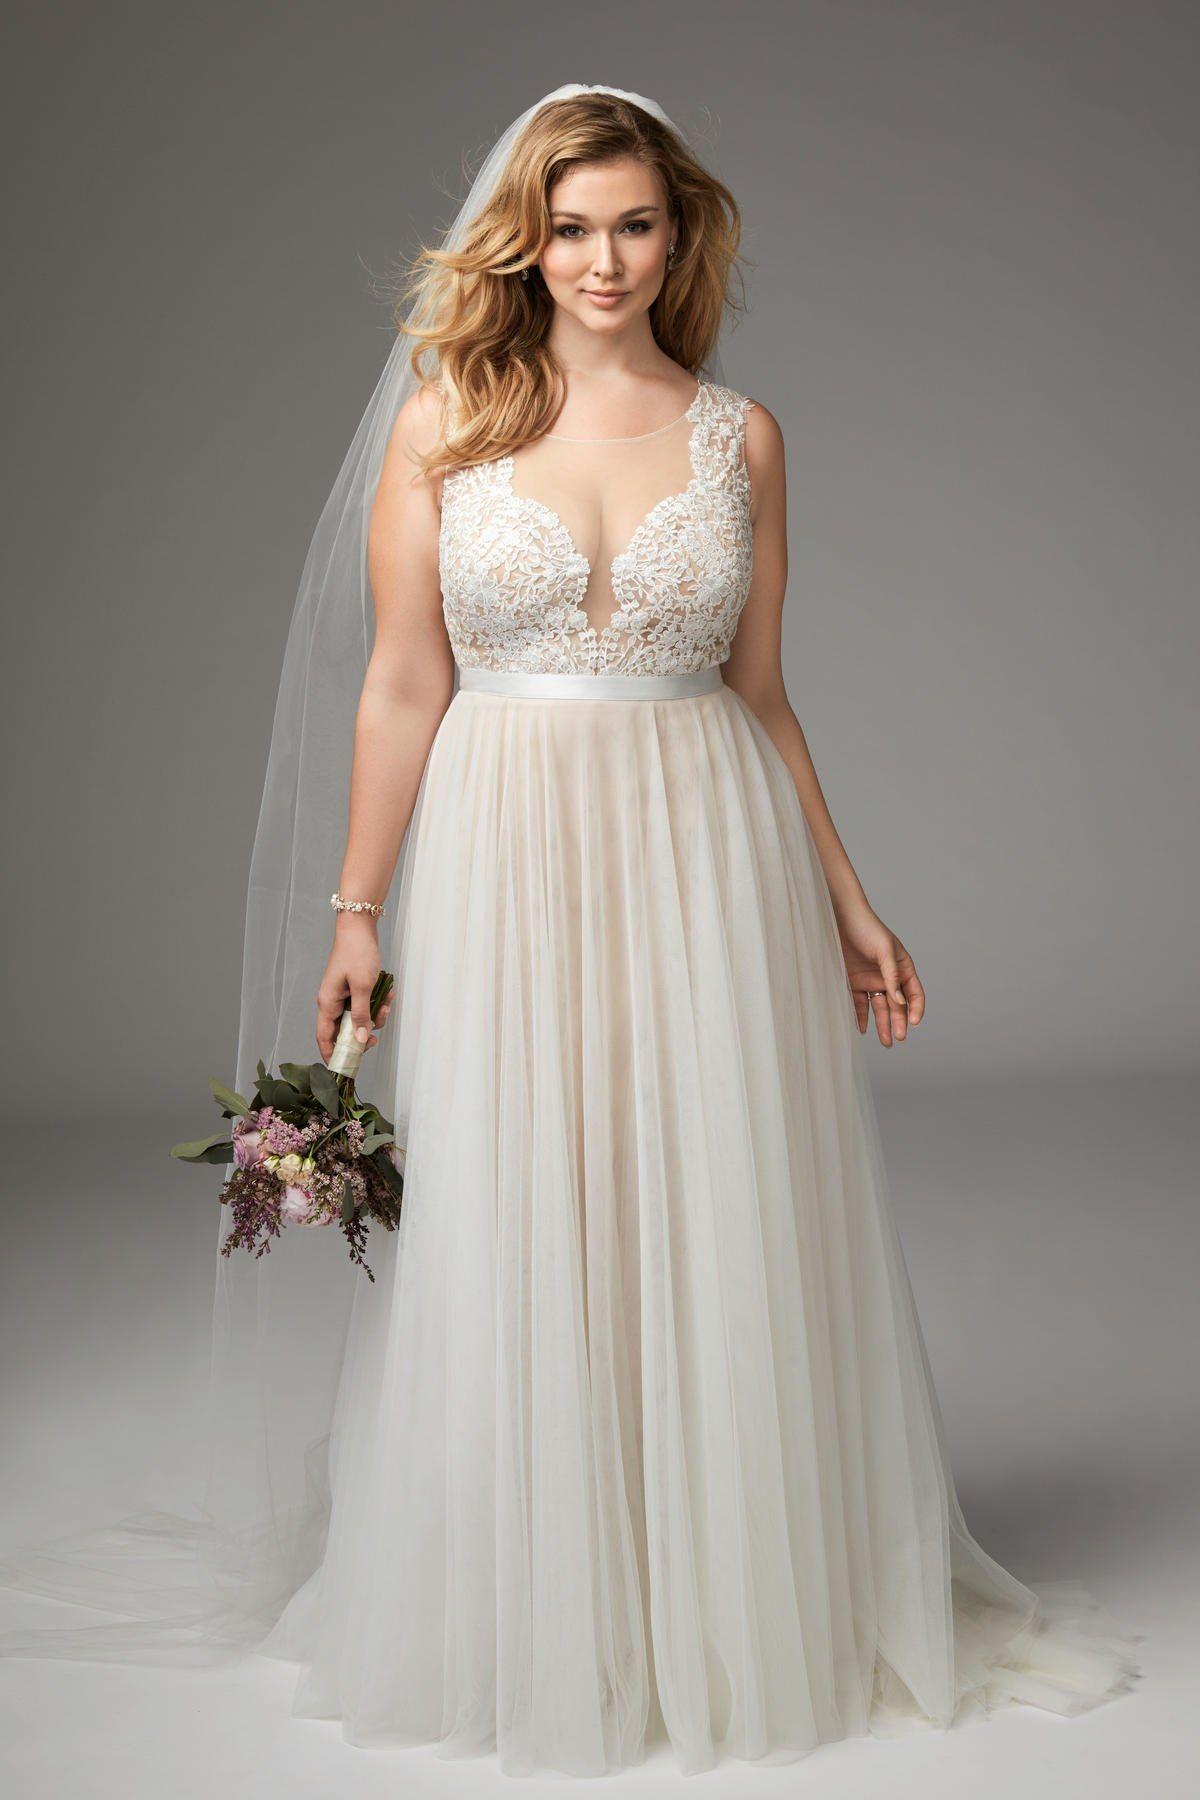 Pin by shoperzz delight on elegant plus size wedding dresses